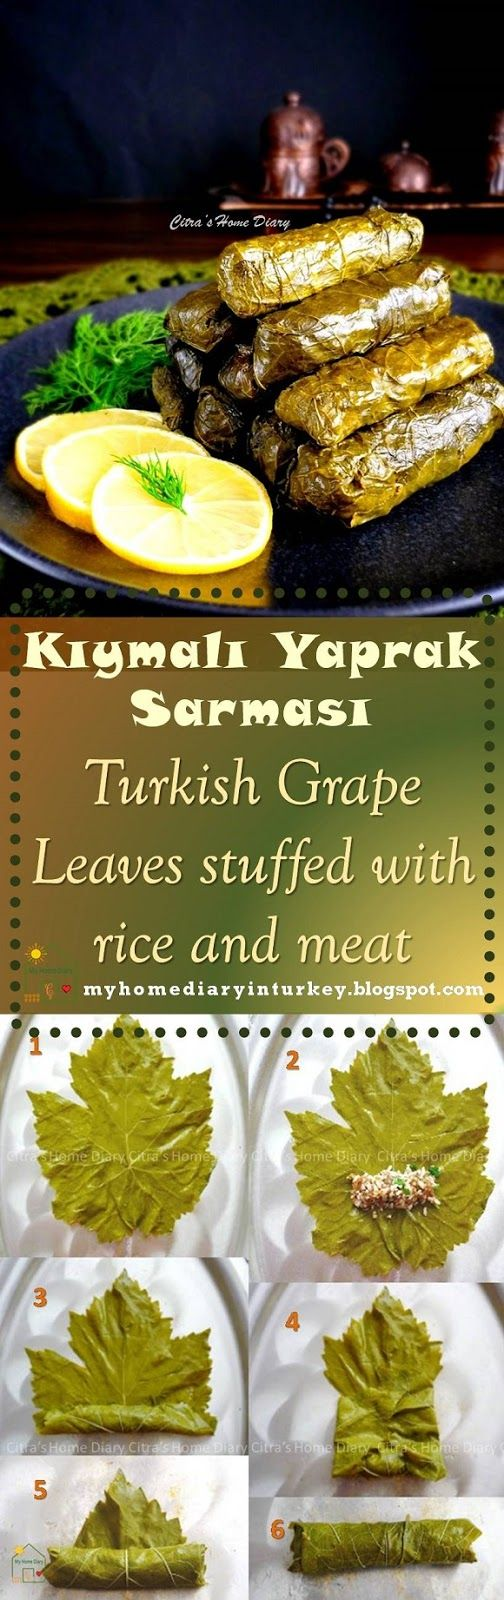 Kıymalı Yaprak Sarması / Turkish Grape Leaves stuffed with rice and meat . #yapraksarma #dolma #turkishdolma #grapeleavesdolma #turkish #appetizer #vegan